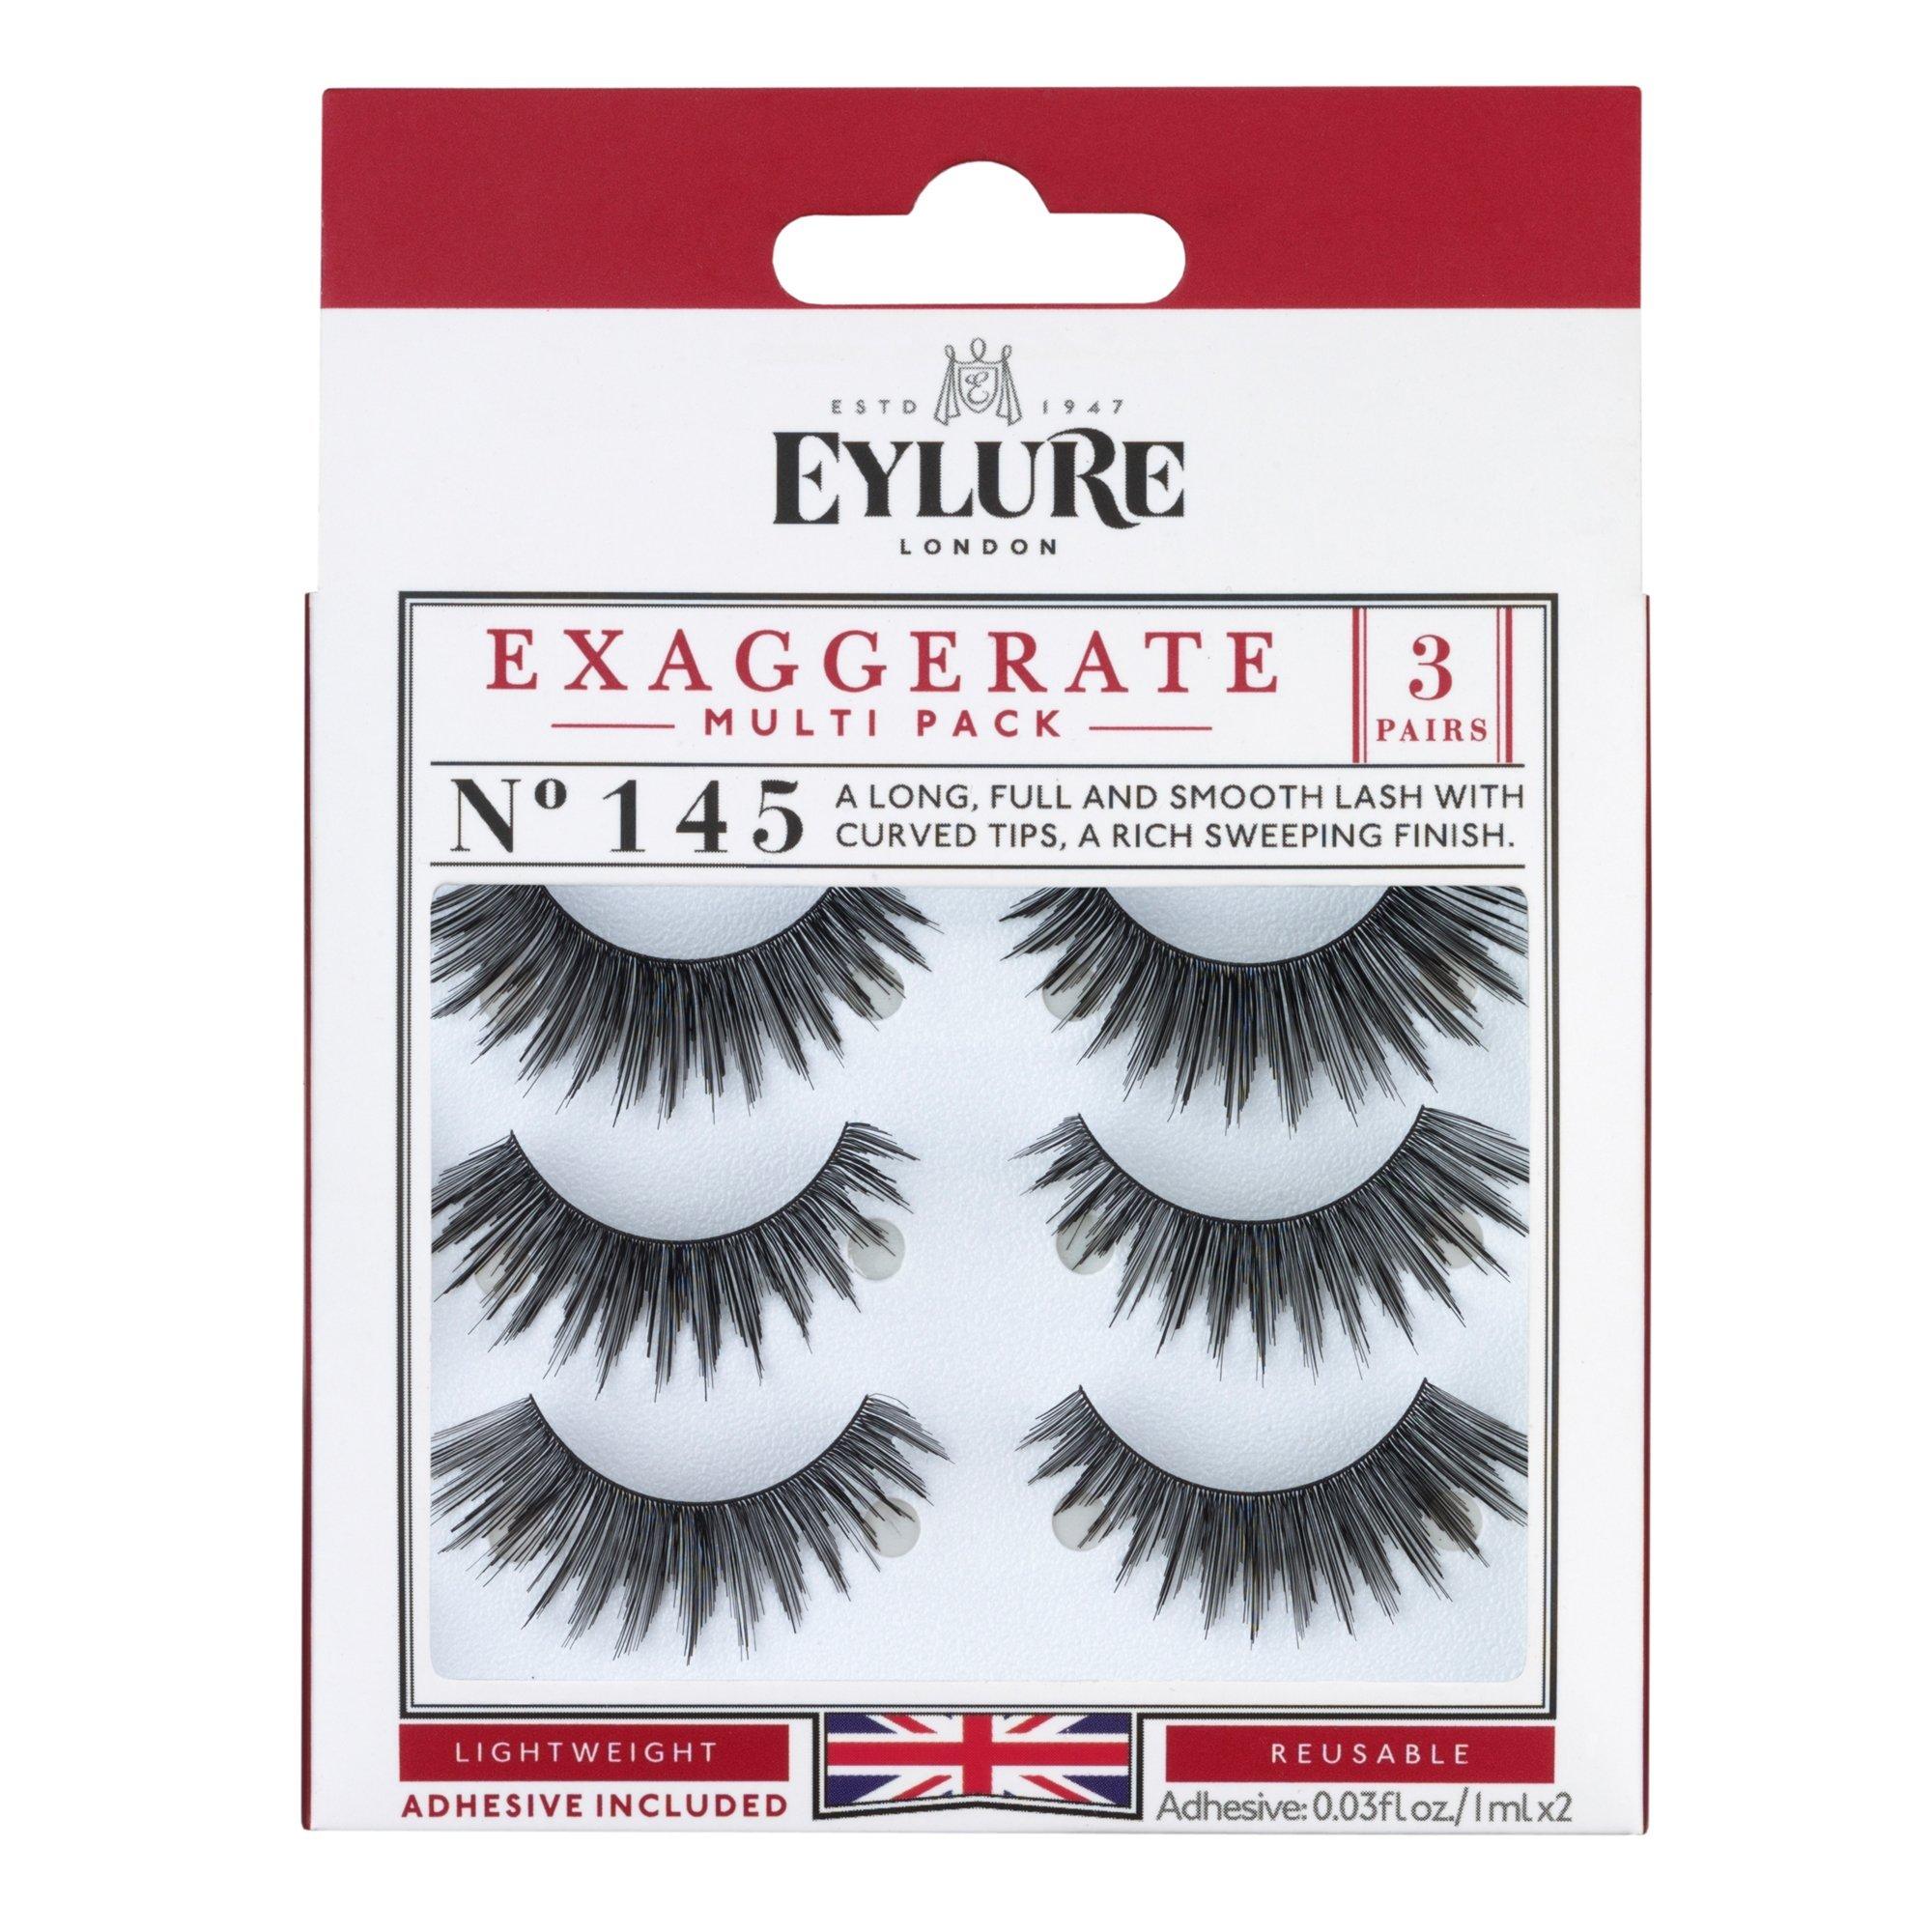 7575897b377 Eylure Exaggerate False Eyelash Multipack, Style No. 145, Reusable,  Adhesive Included,